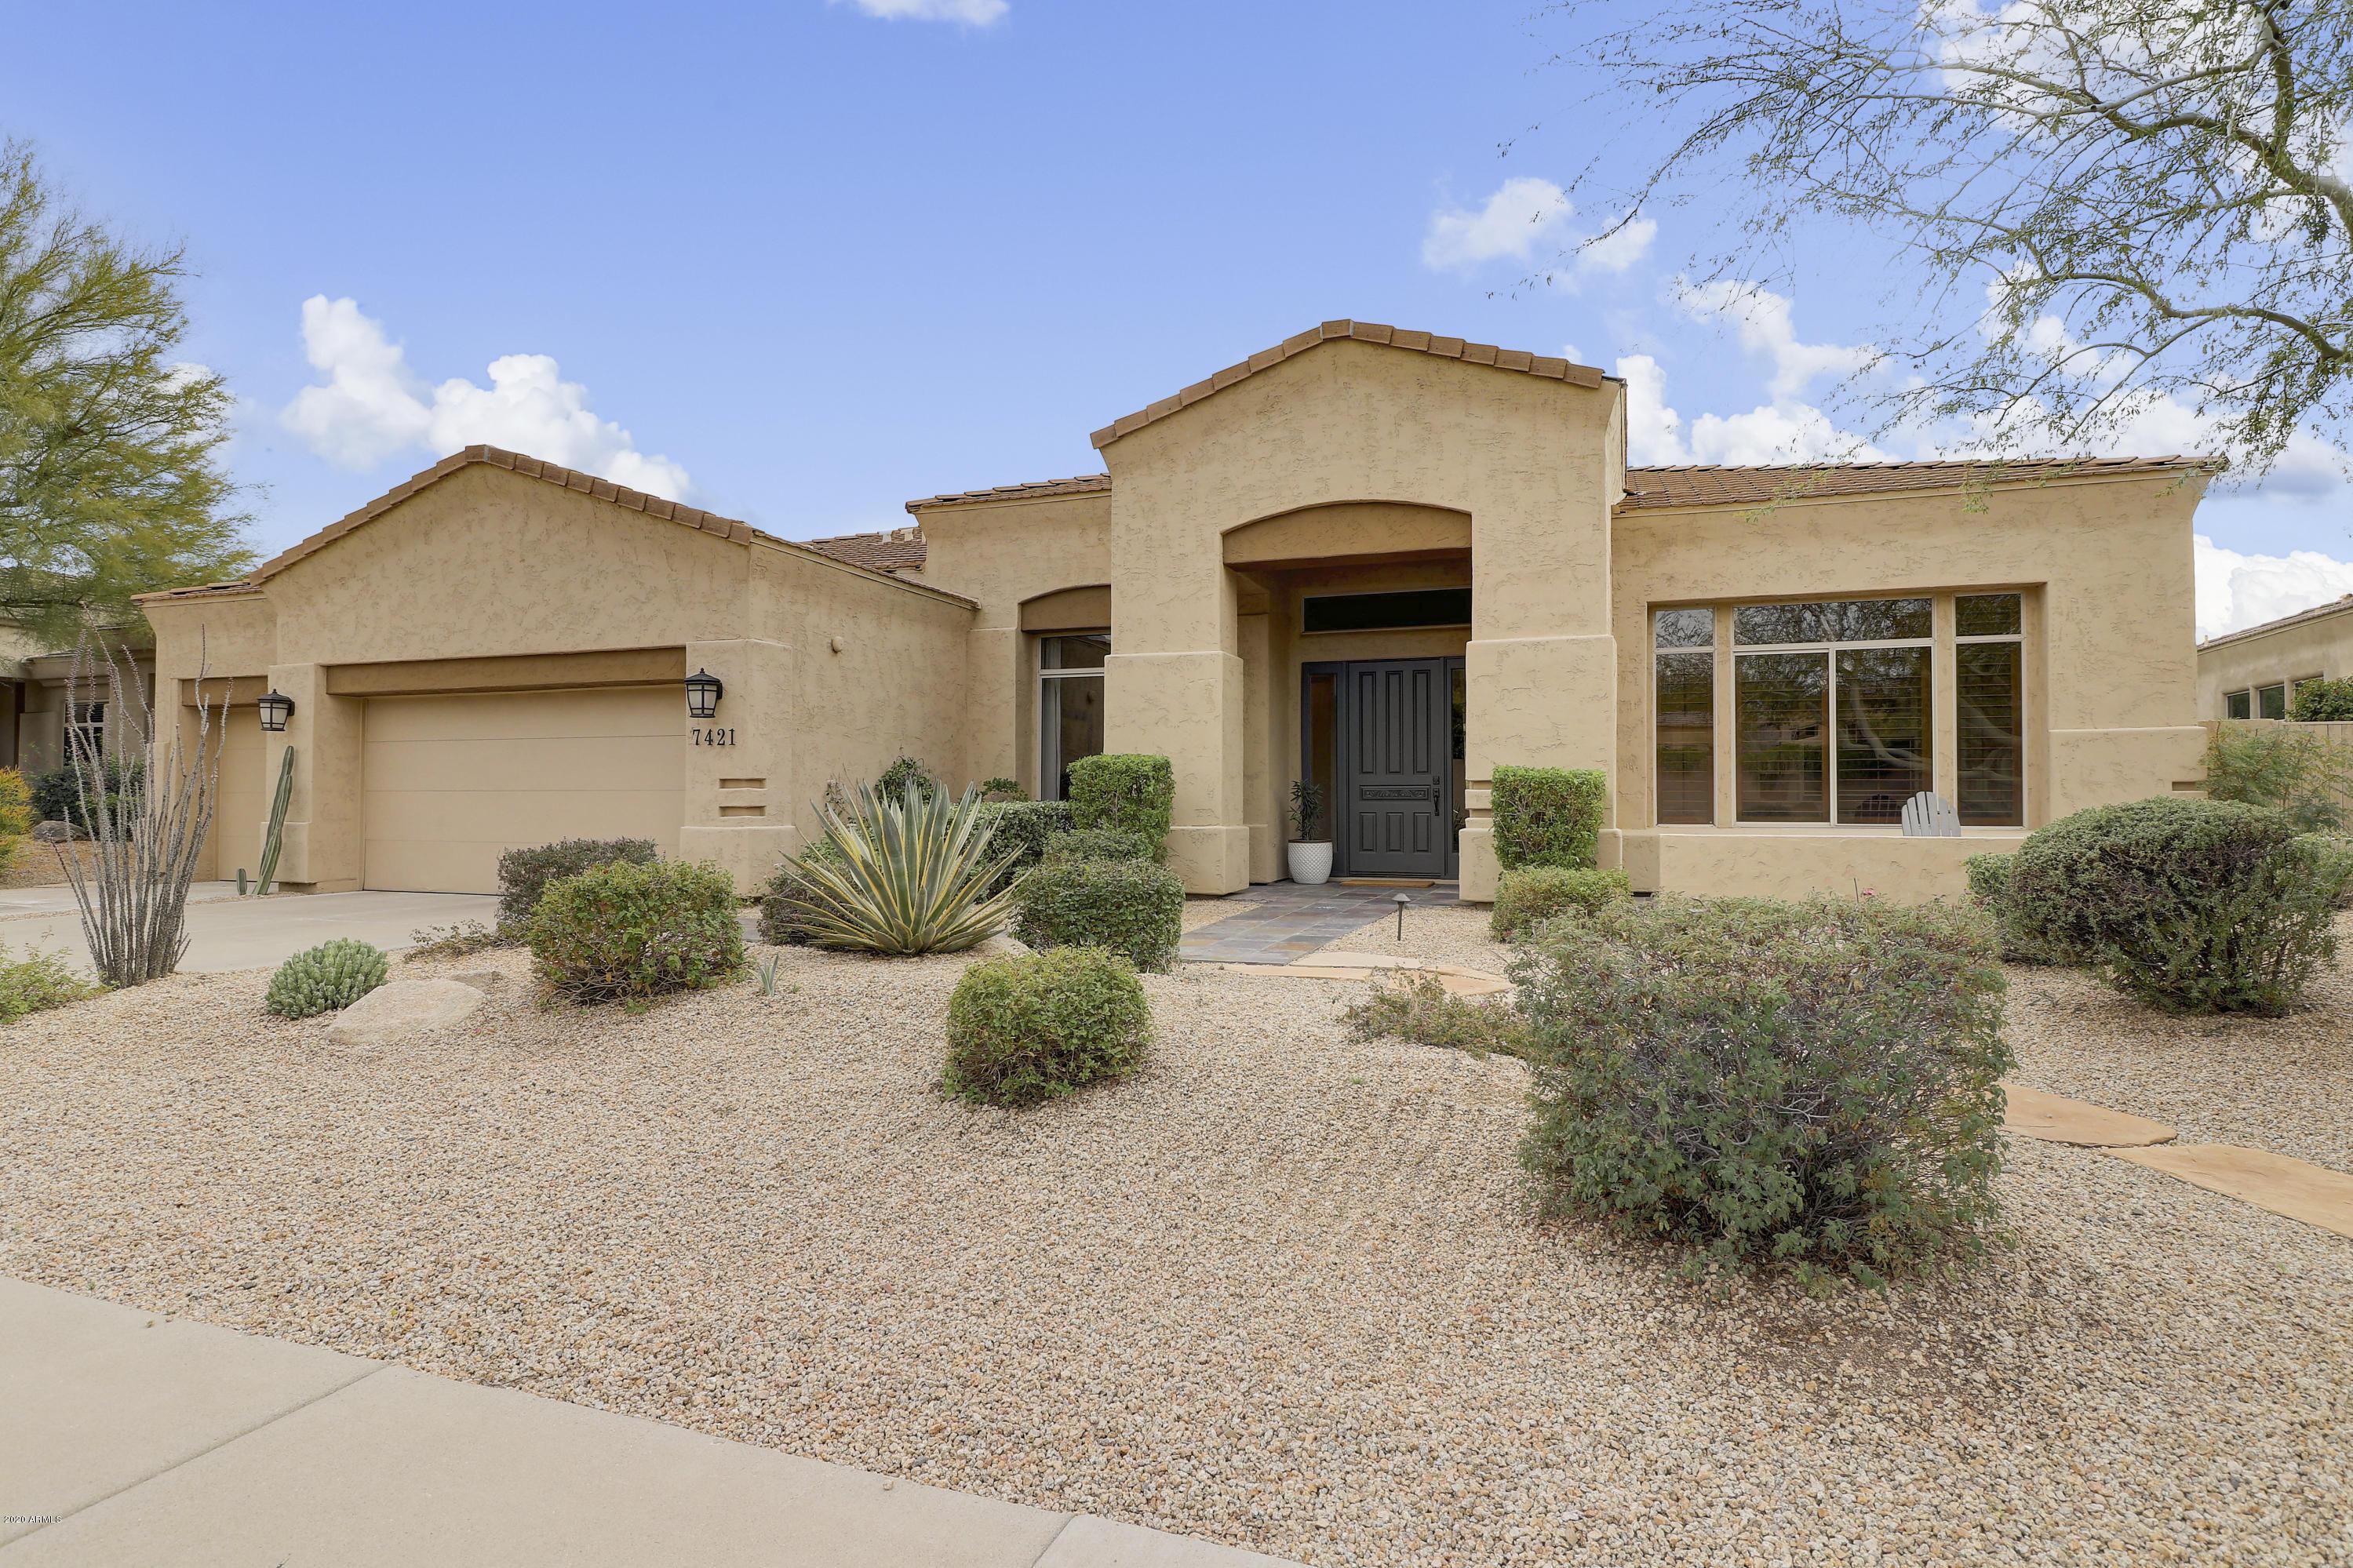 Photo of 7421 E WING SHADOW Road, Scottsdale, AZ 85255